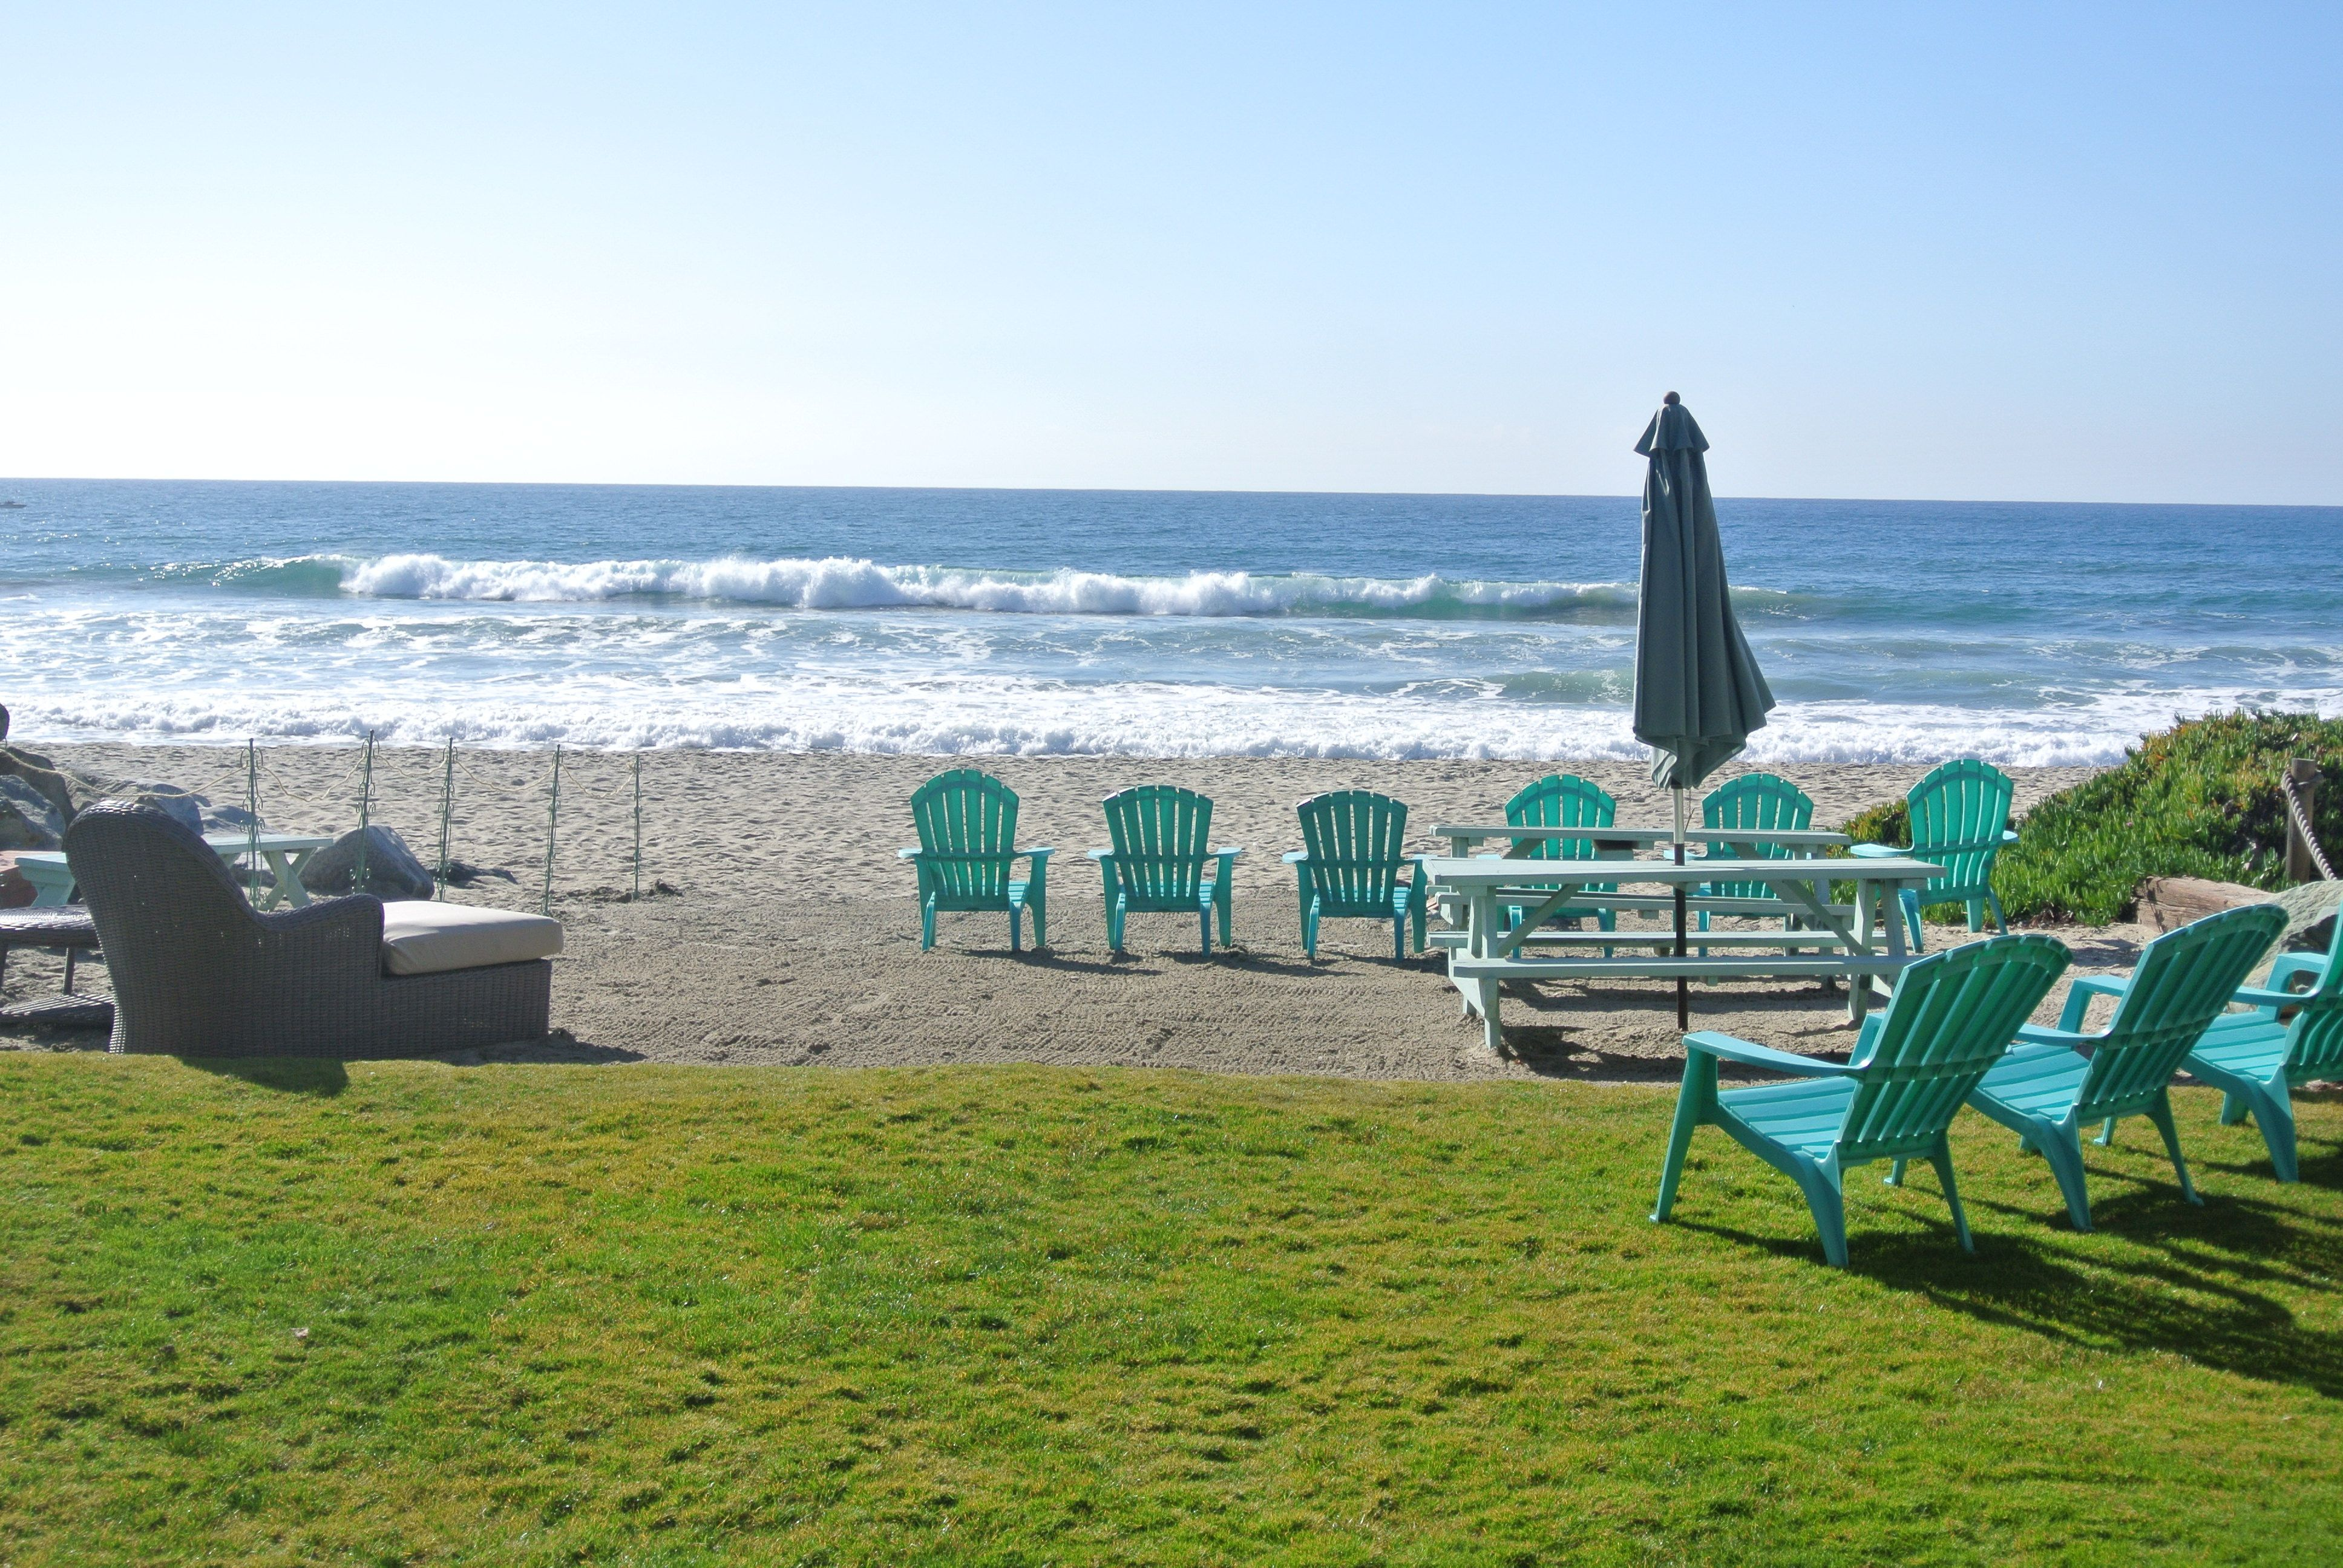 Wedding beach house  Pin by Oceanside Beach Rental on Oceanside Beach Rentals  Pinterest